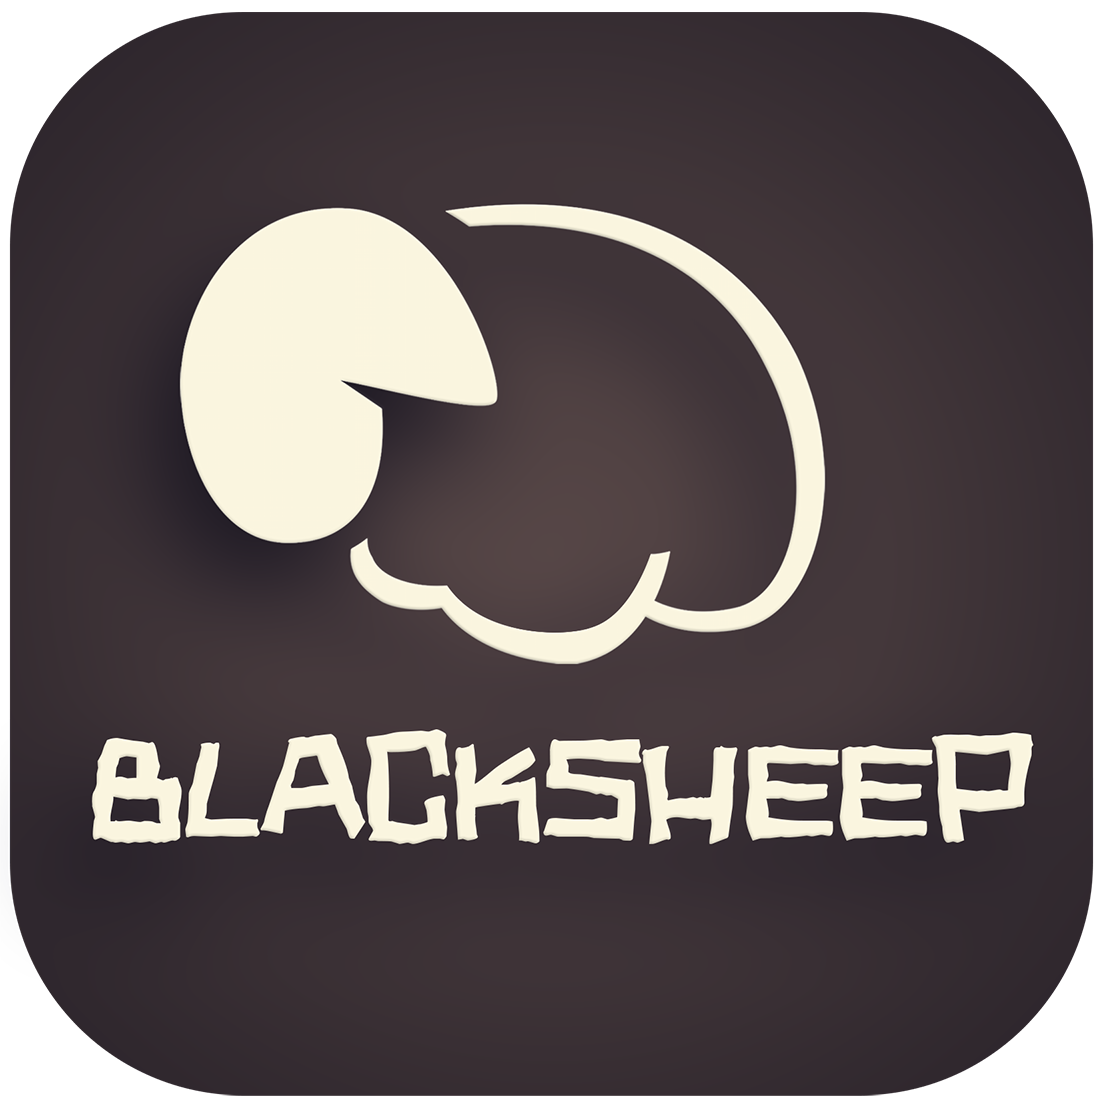 Логотип рок группы BLACKSHEEP